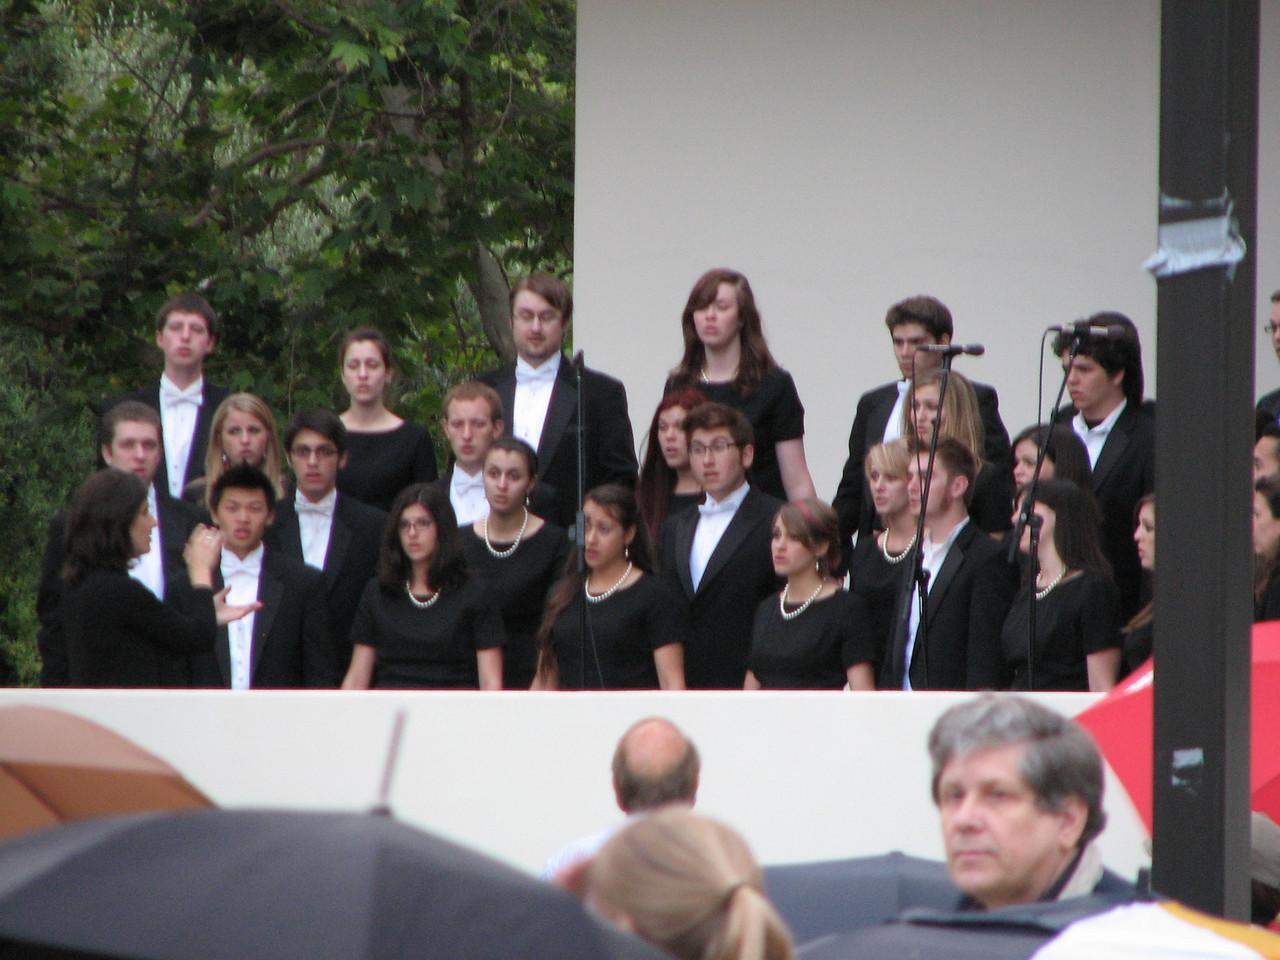 2008 05 23 Fri - Biola Chorales @ graduate students graduation ceremony